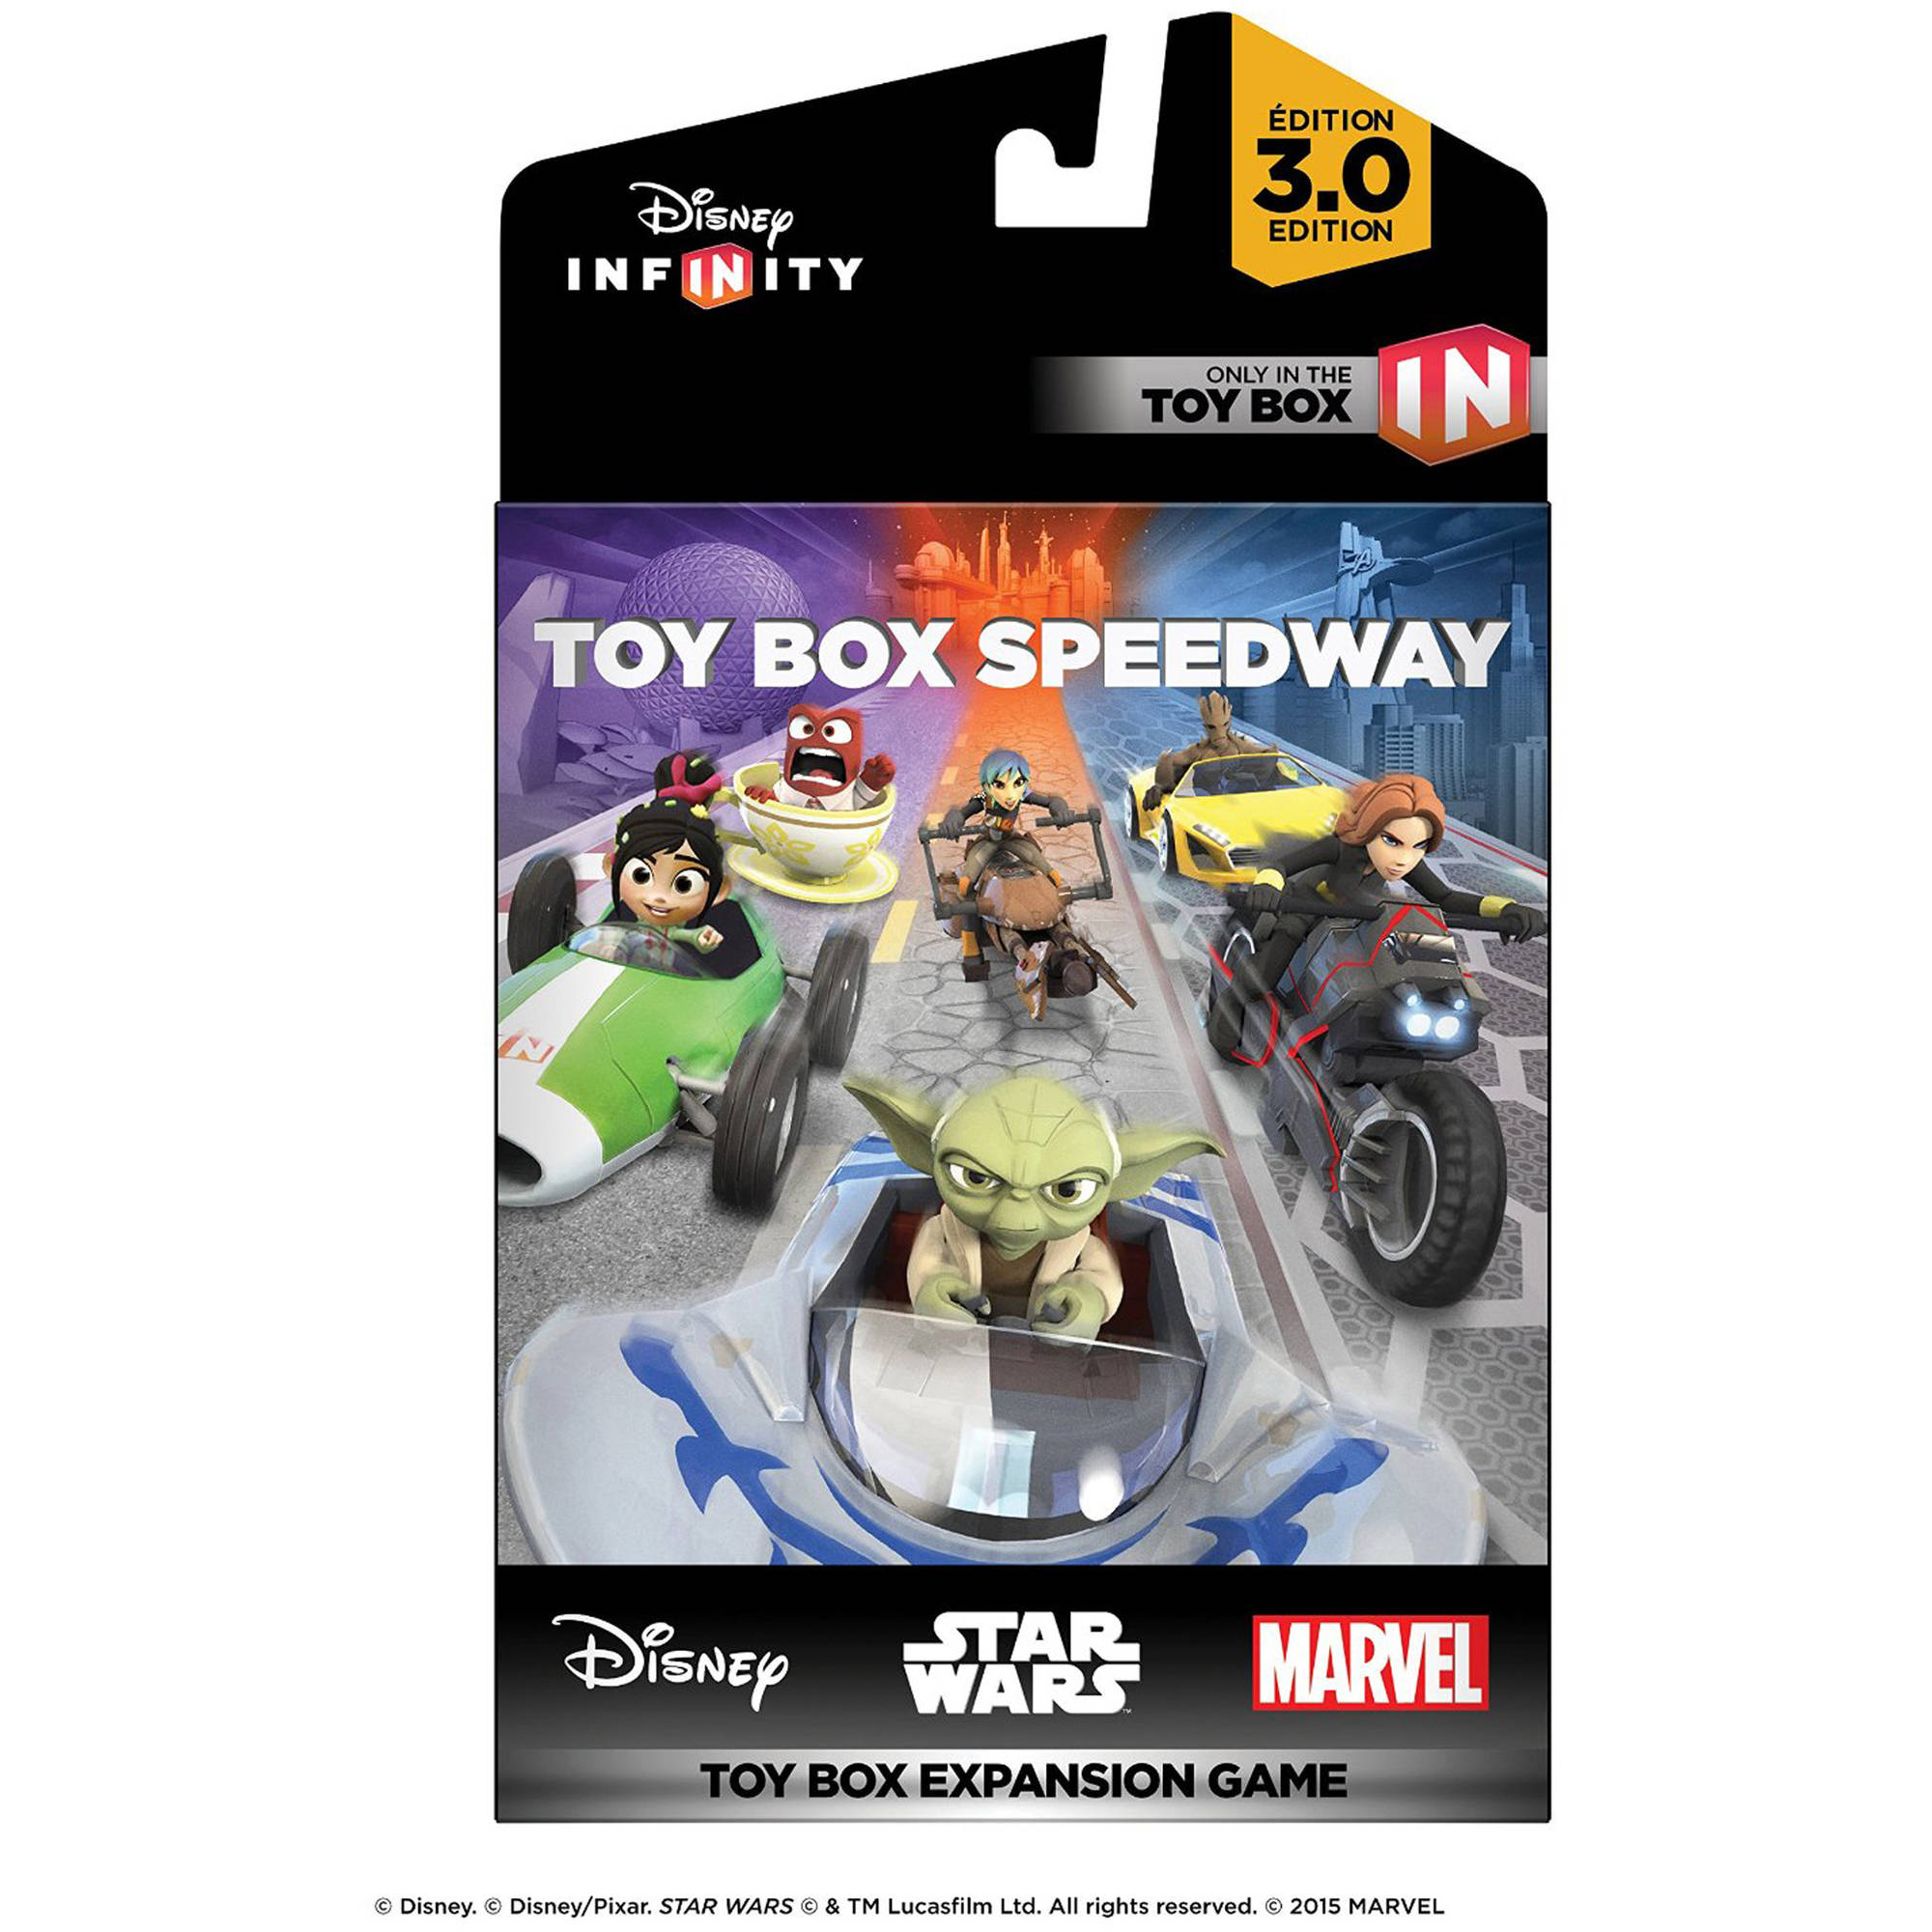 Disney Infinity 3.0 Edition Toy Box Speedway